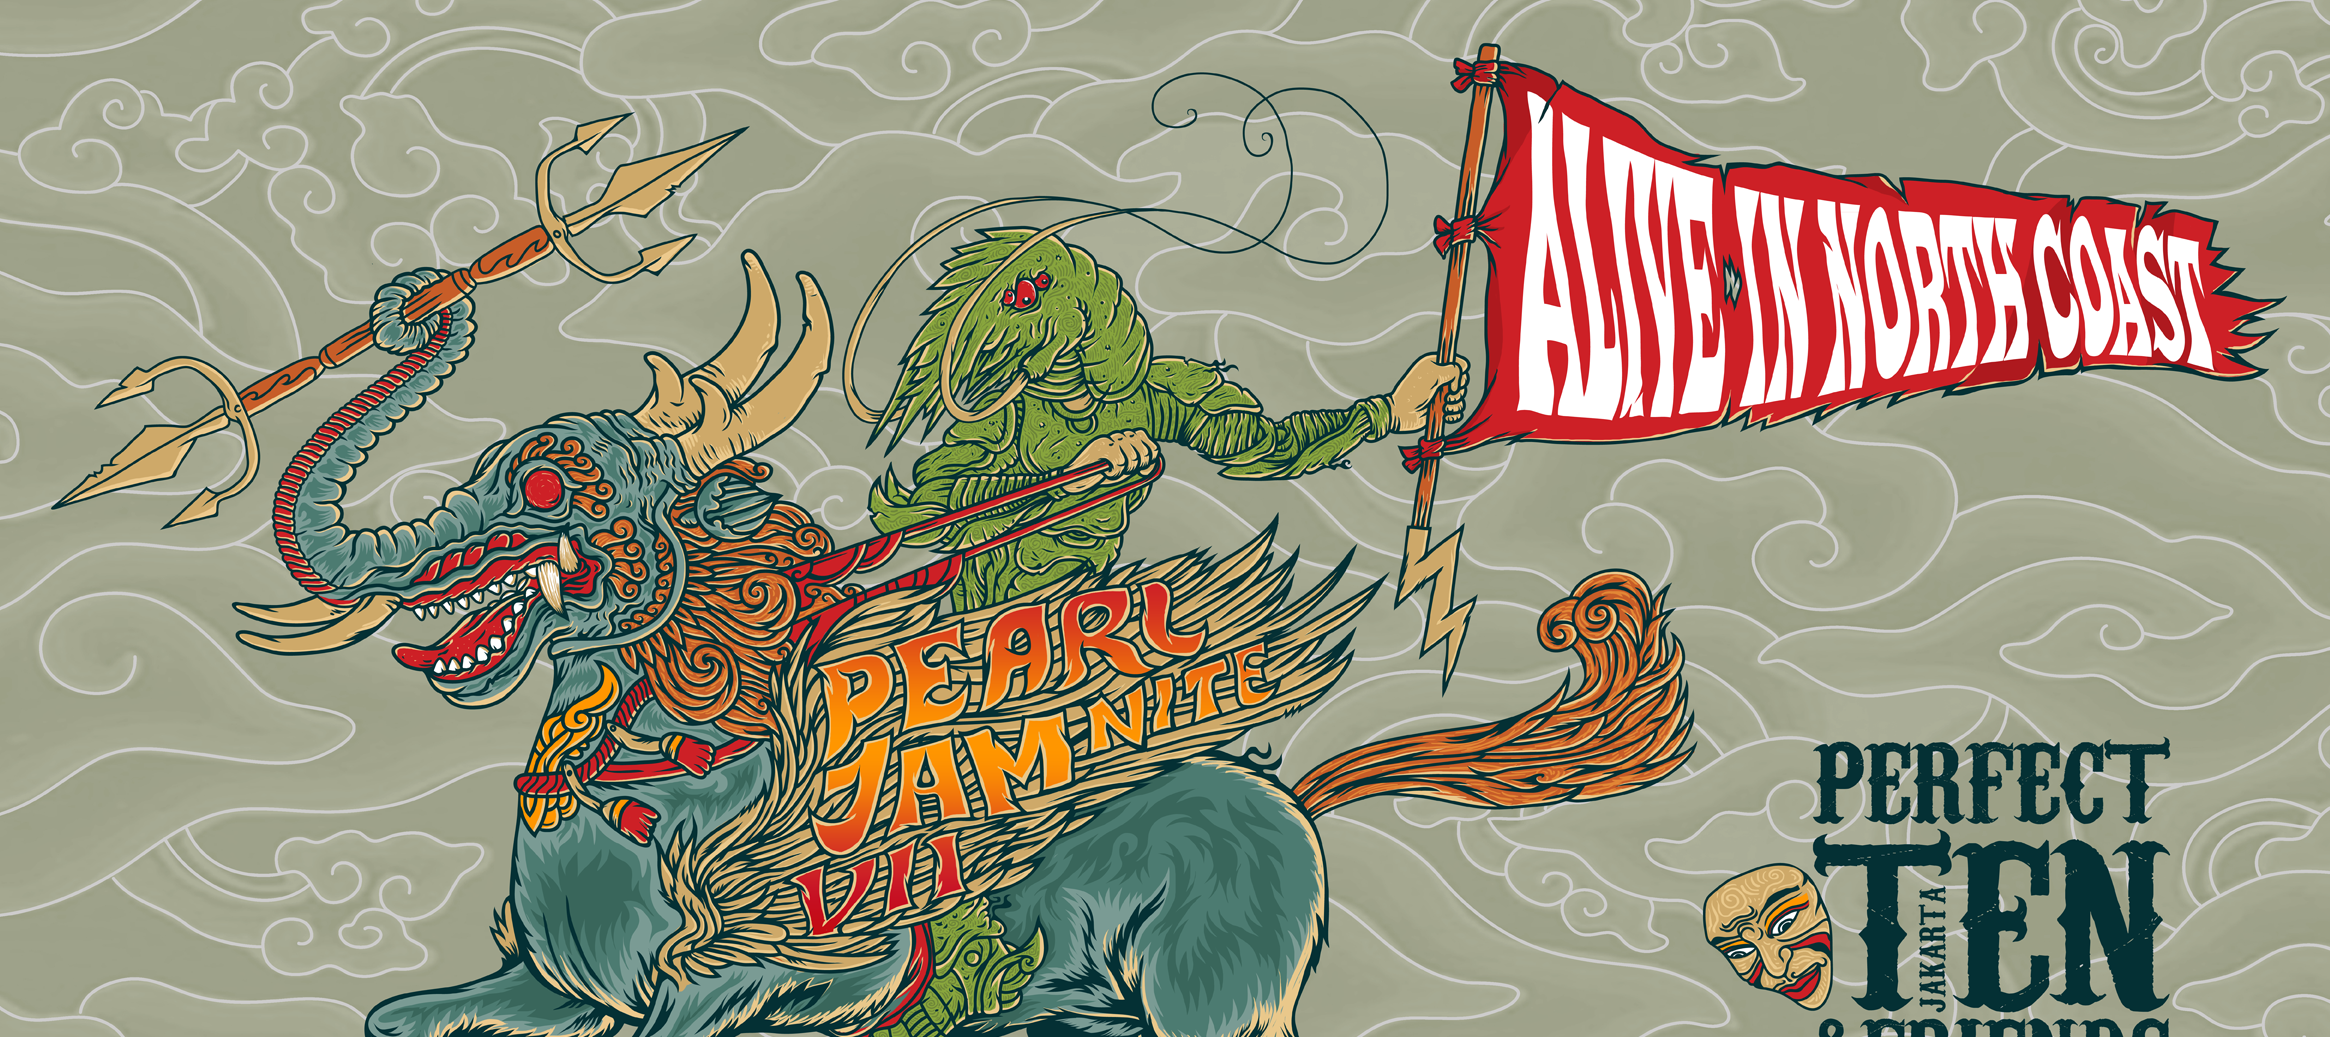 Cirebon Siap Gelar Pearl Jam Nite VII!